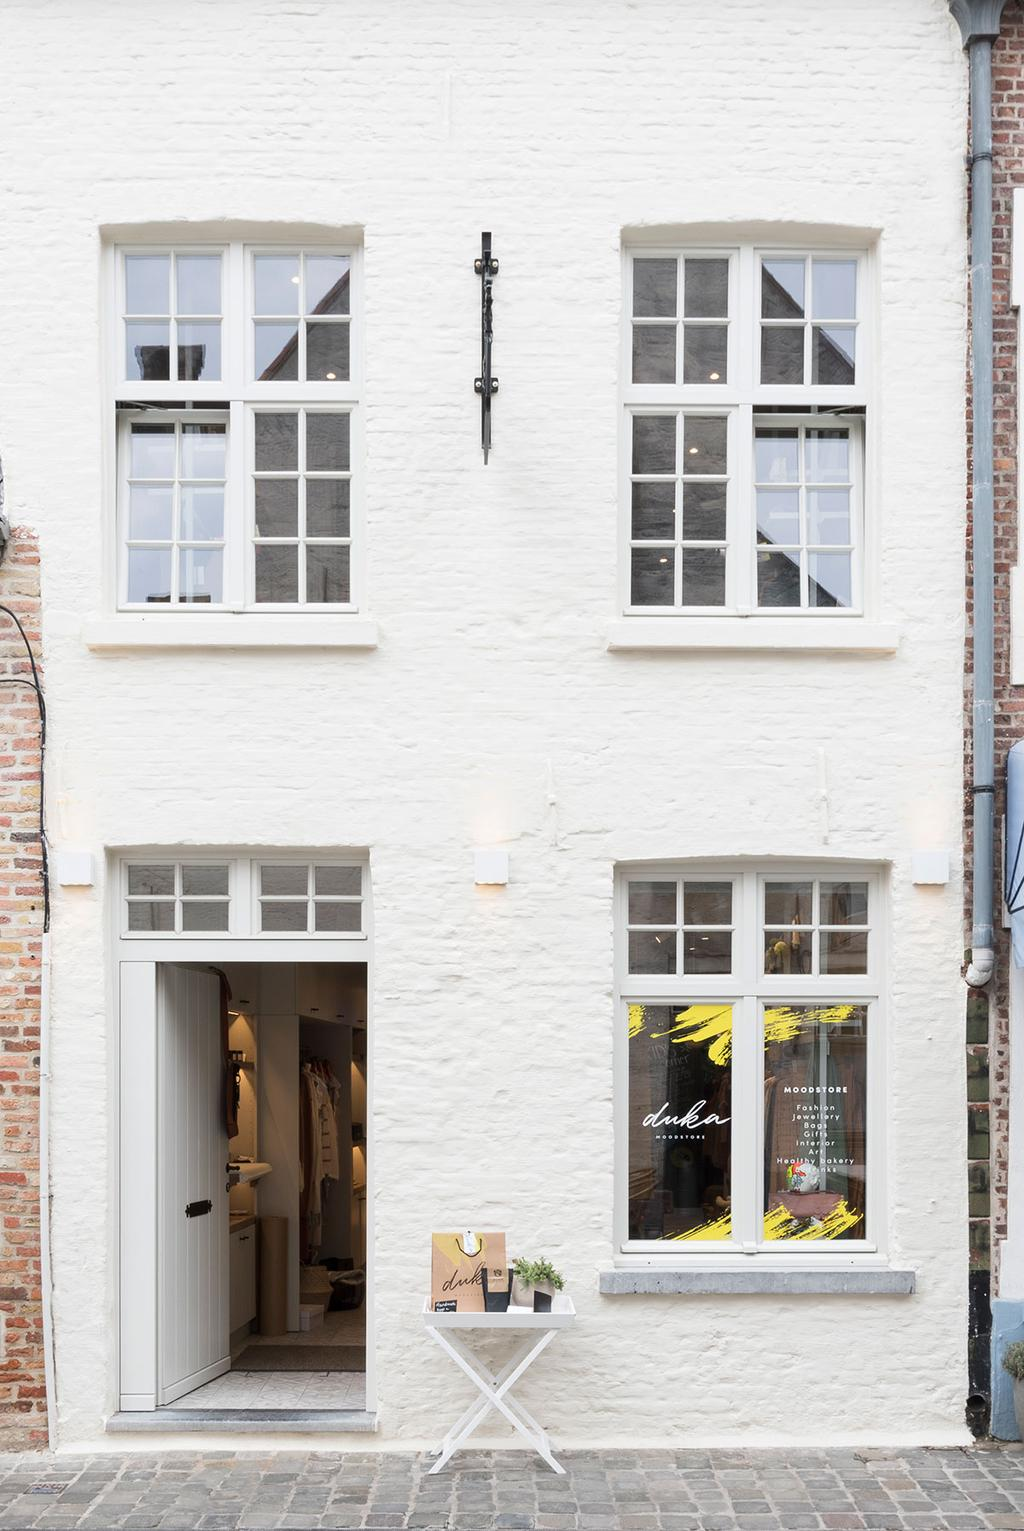 Duka Moodstore in Brugge